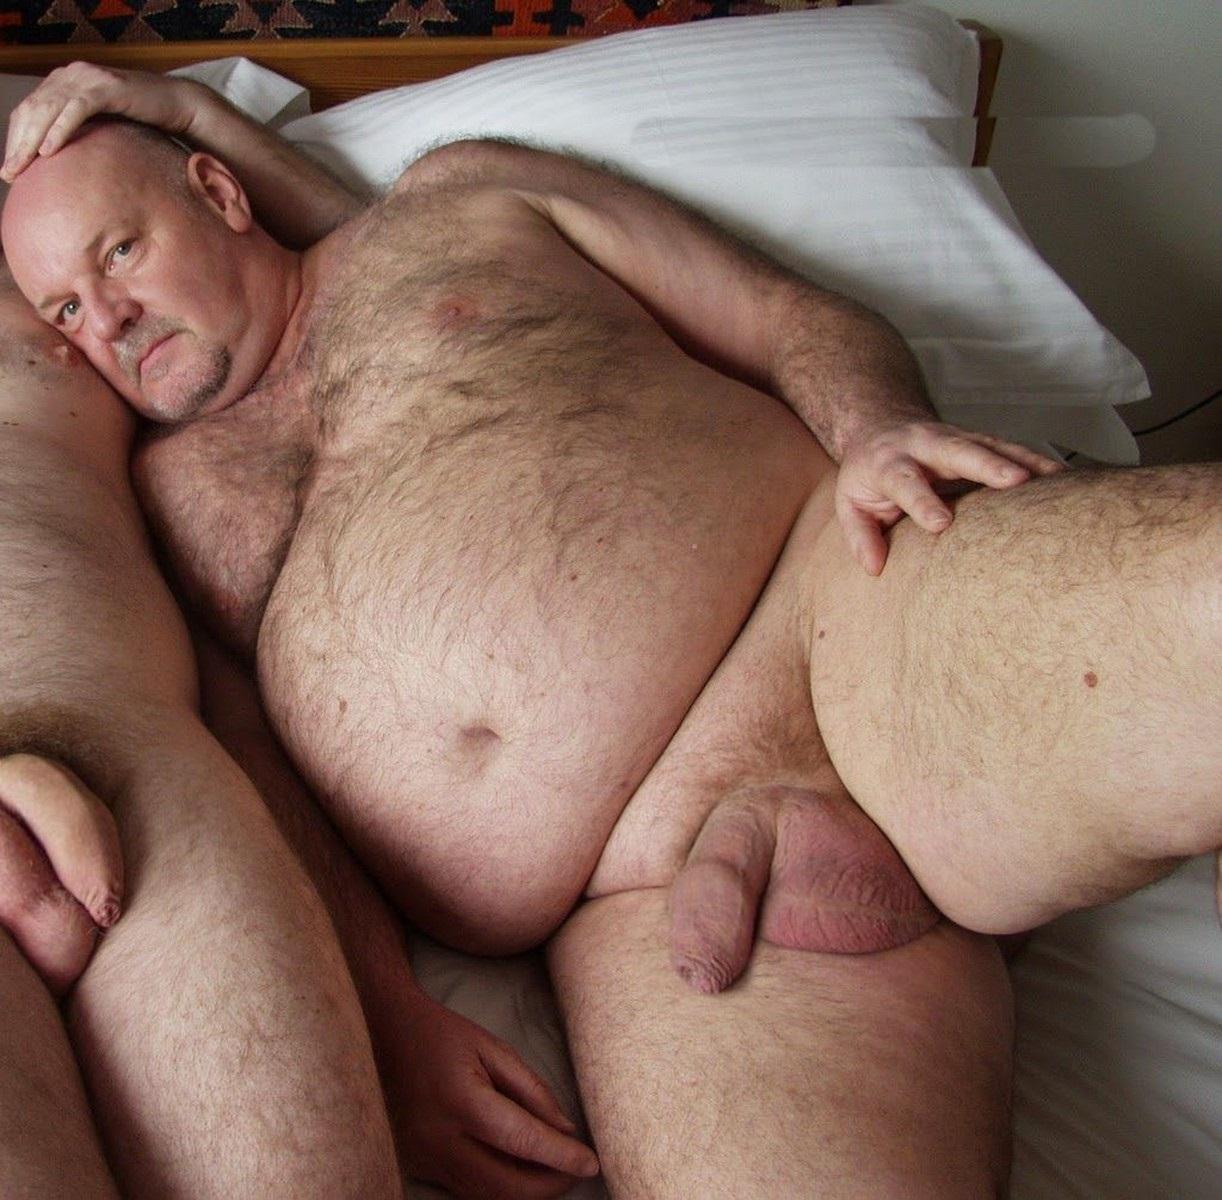 Chubby uncut men, namrata shrestha sex videos